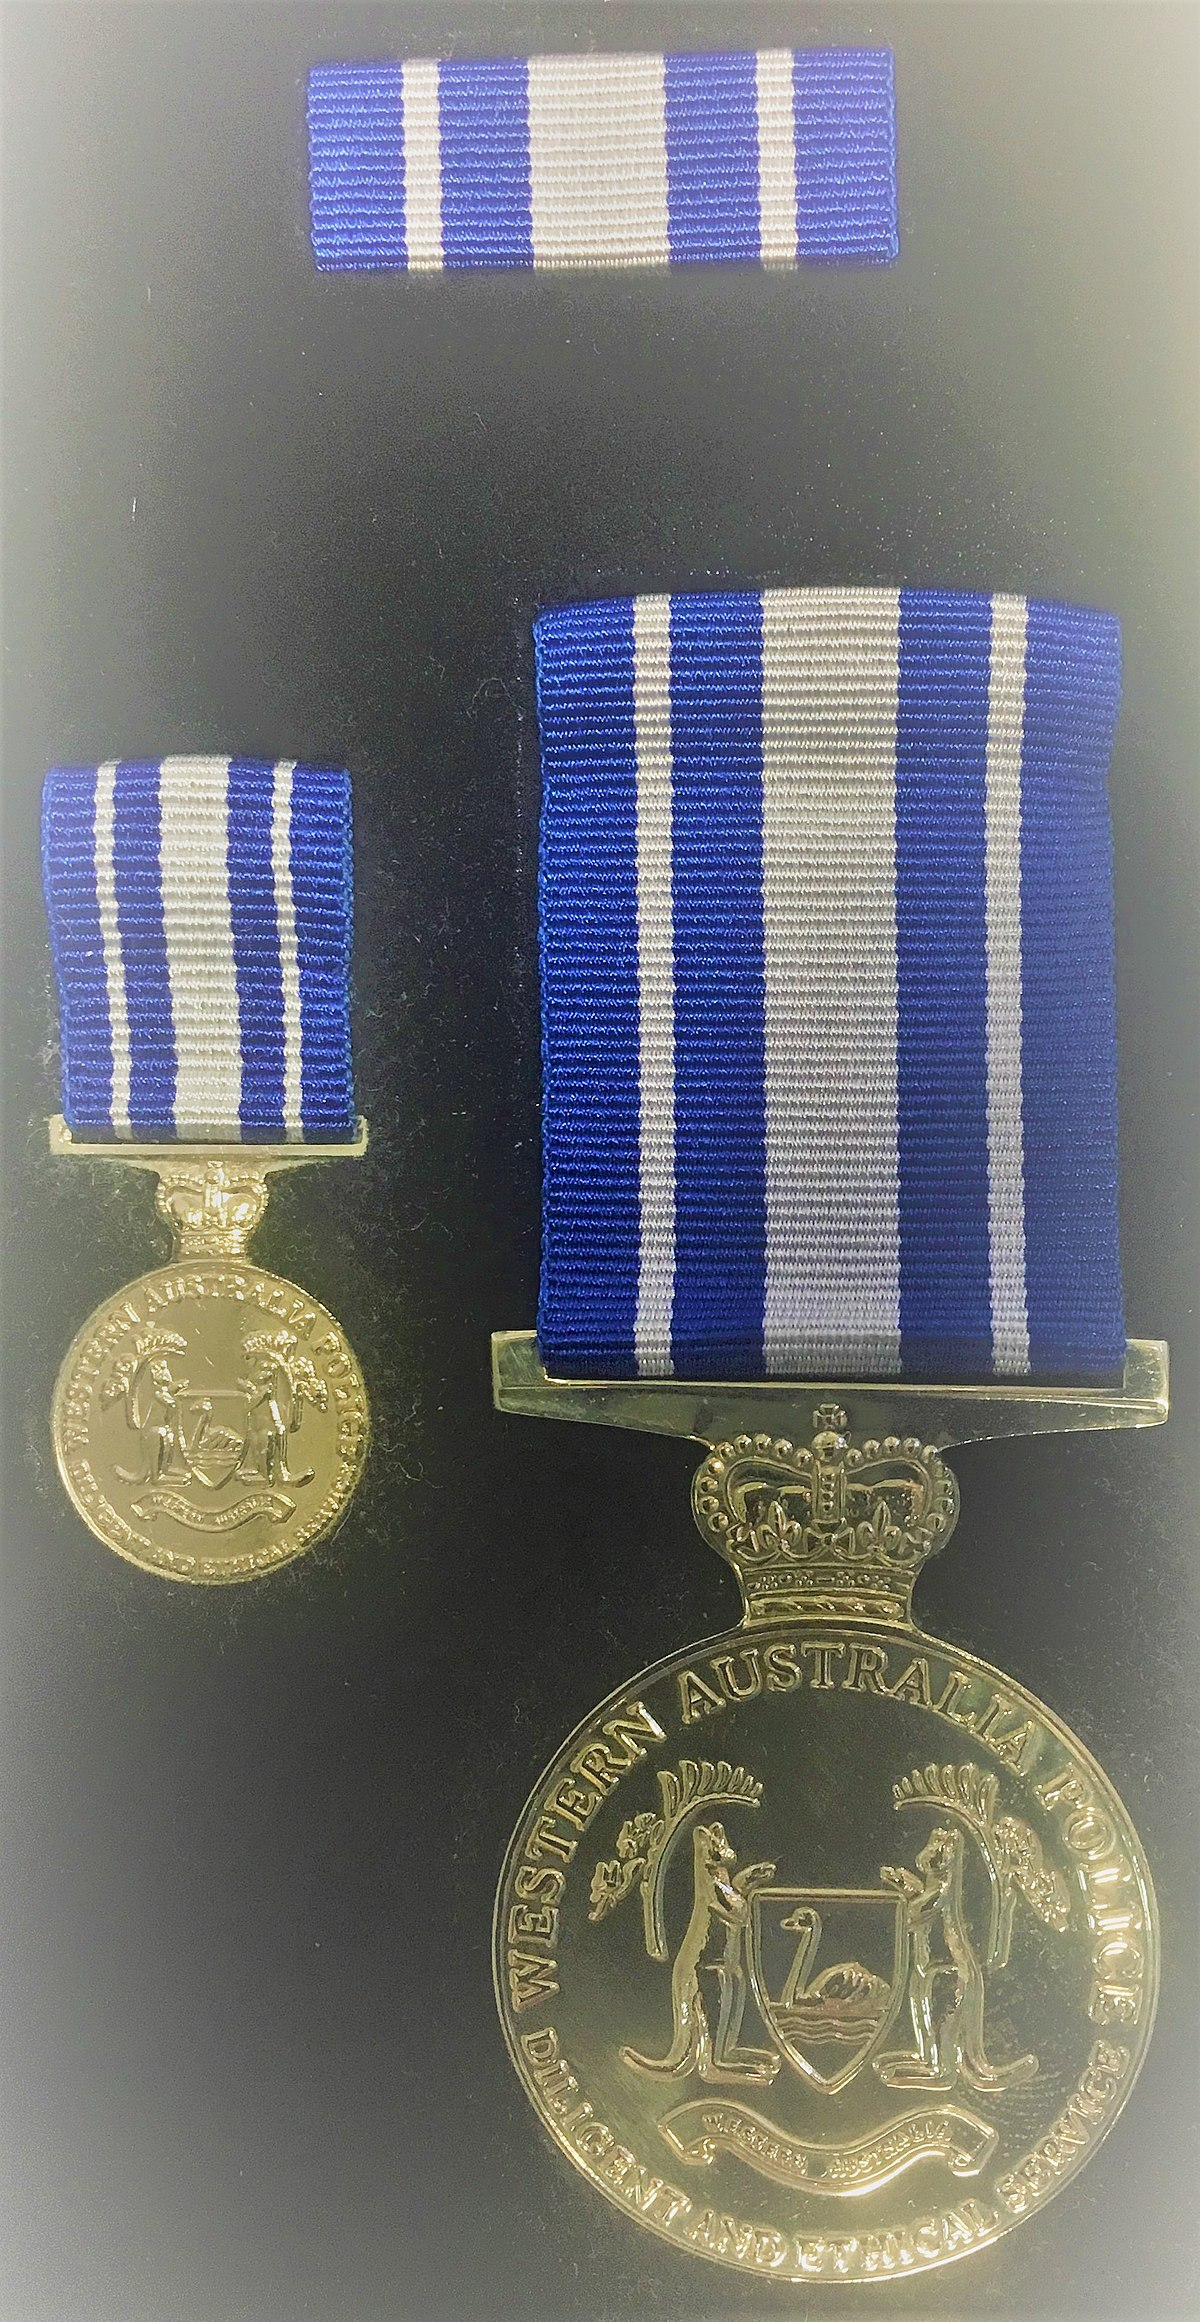 Western Australia Police Medal - Wikipedia